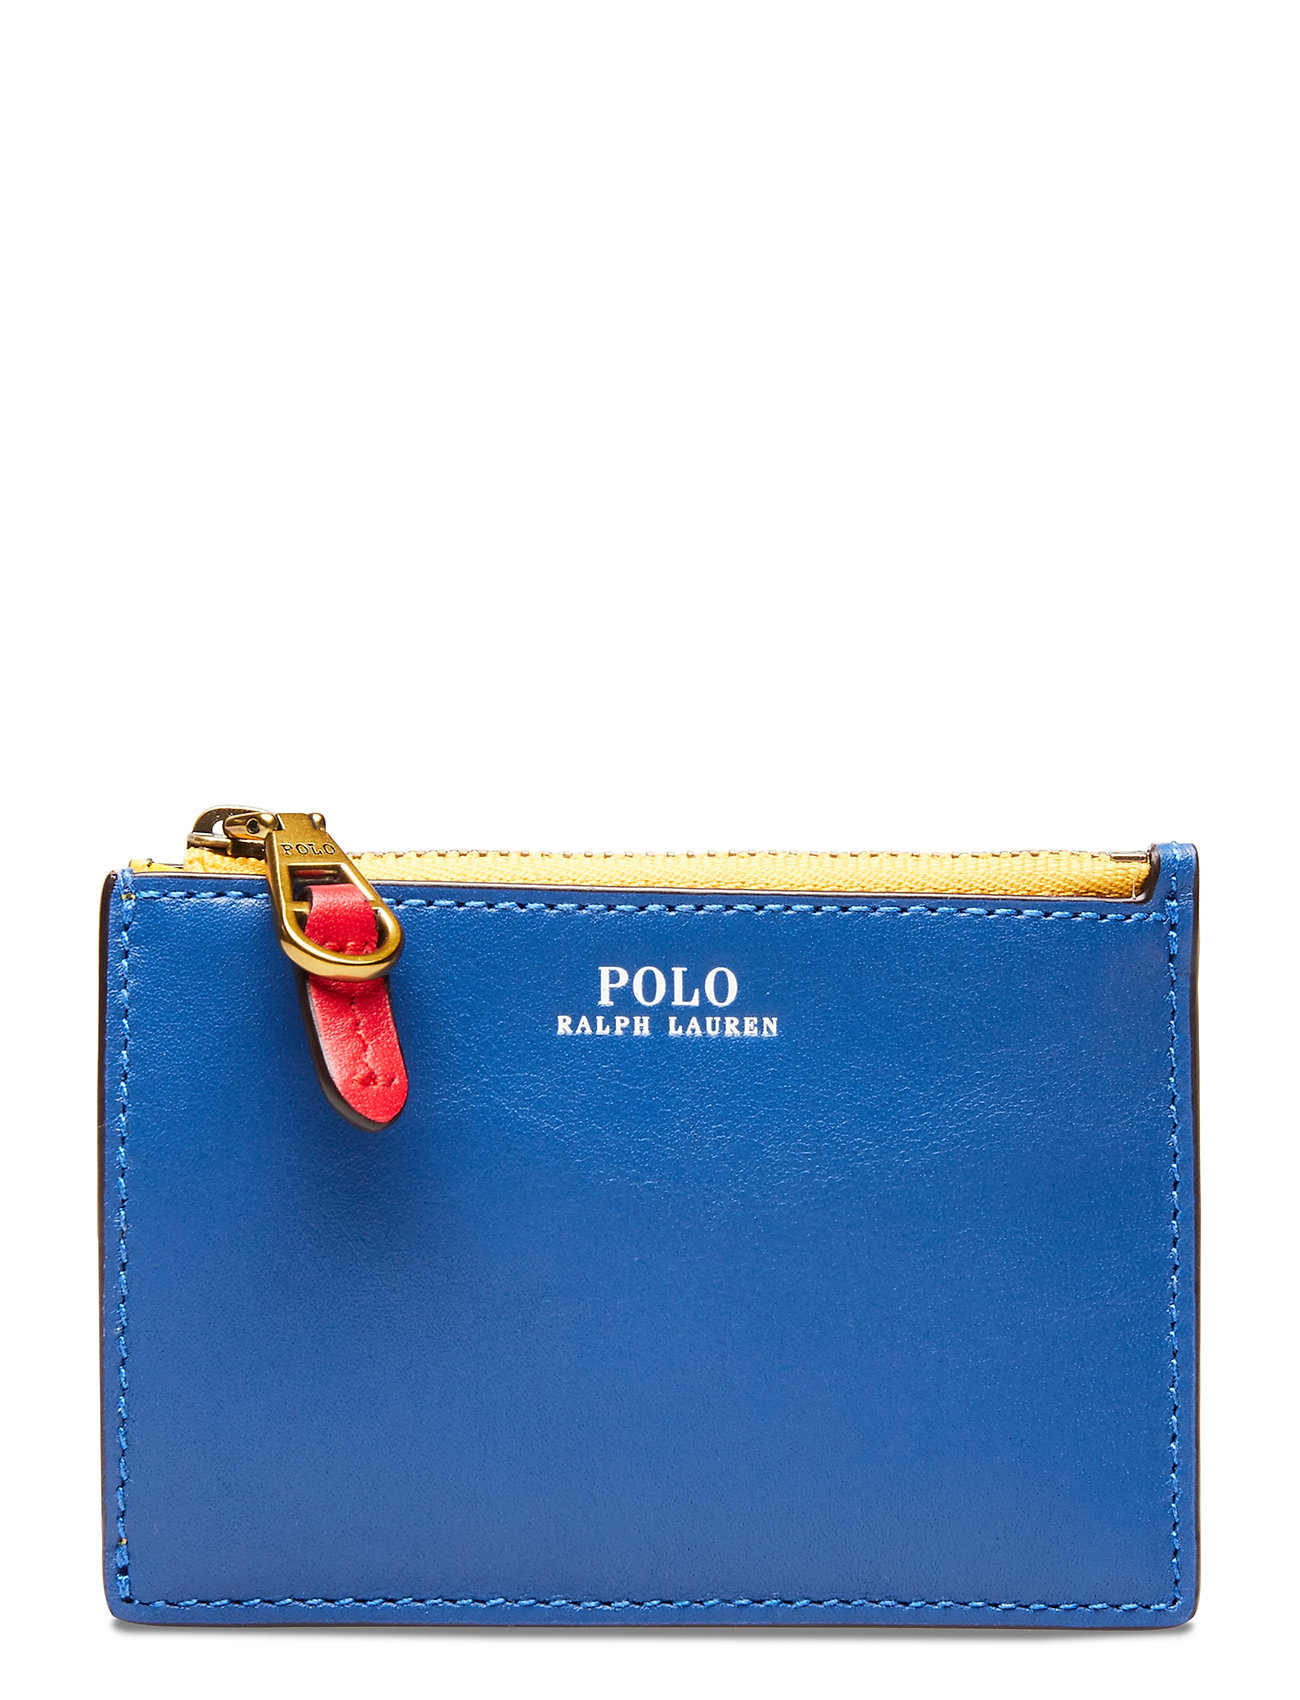 Polo Ralph Lauren Color-Blocked Card Case - MULTI